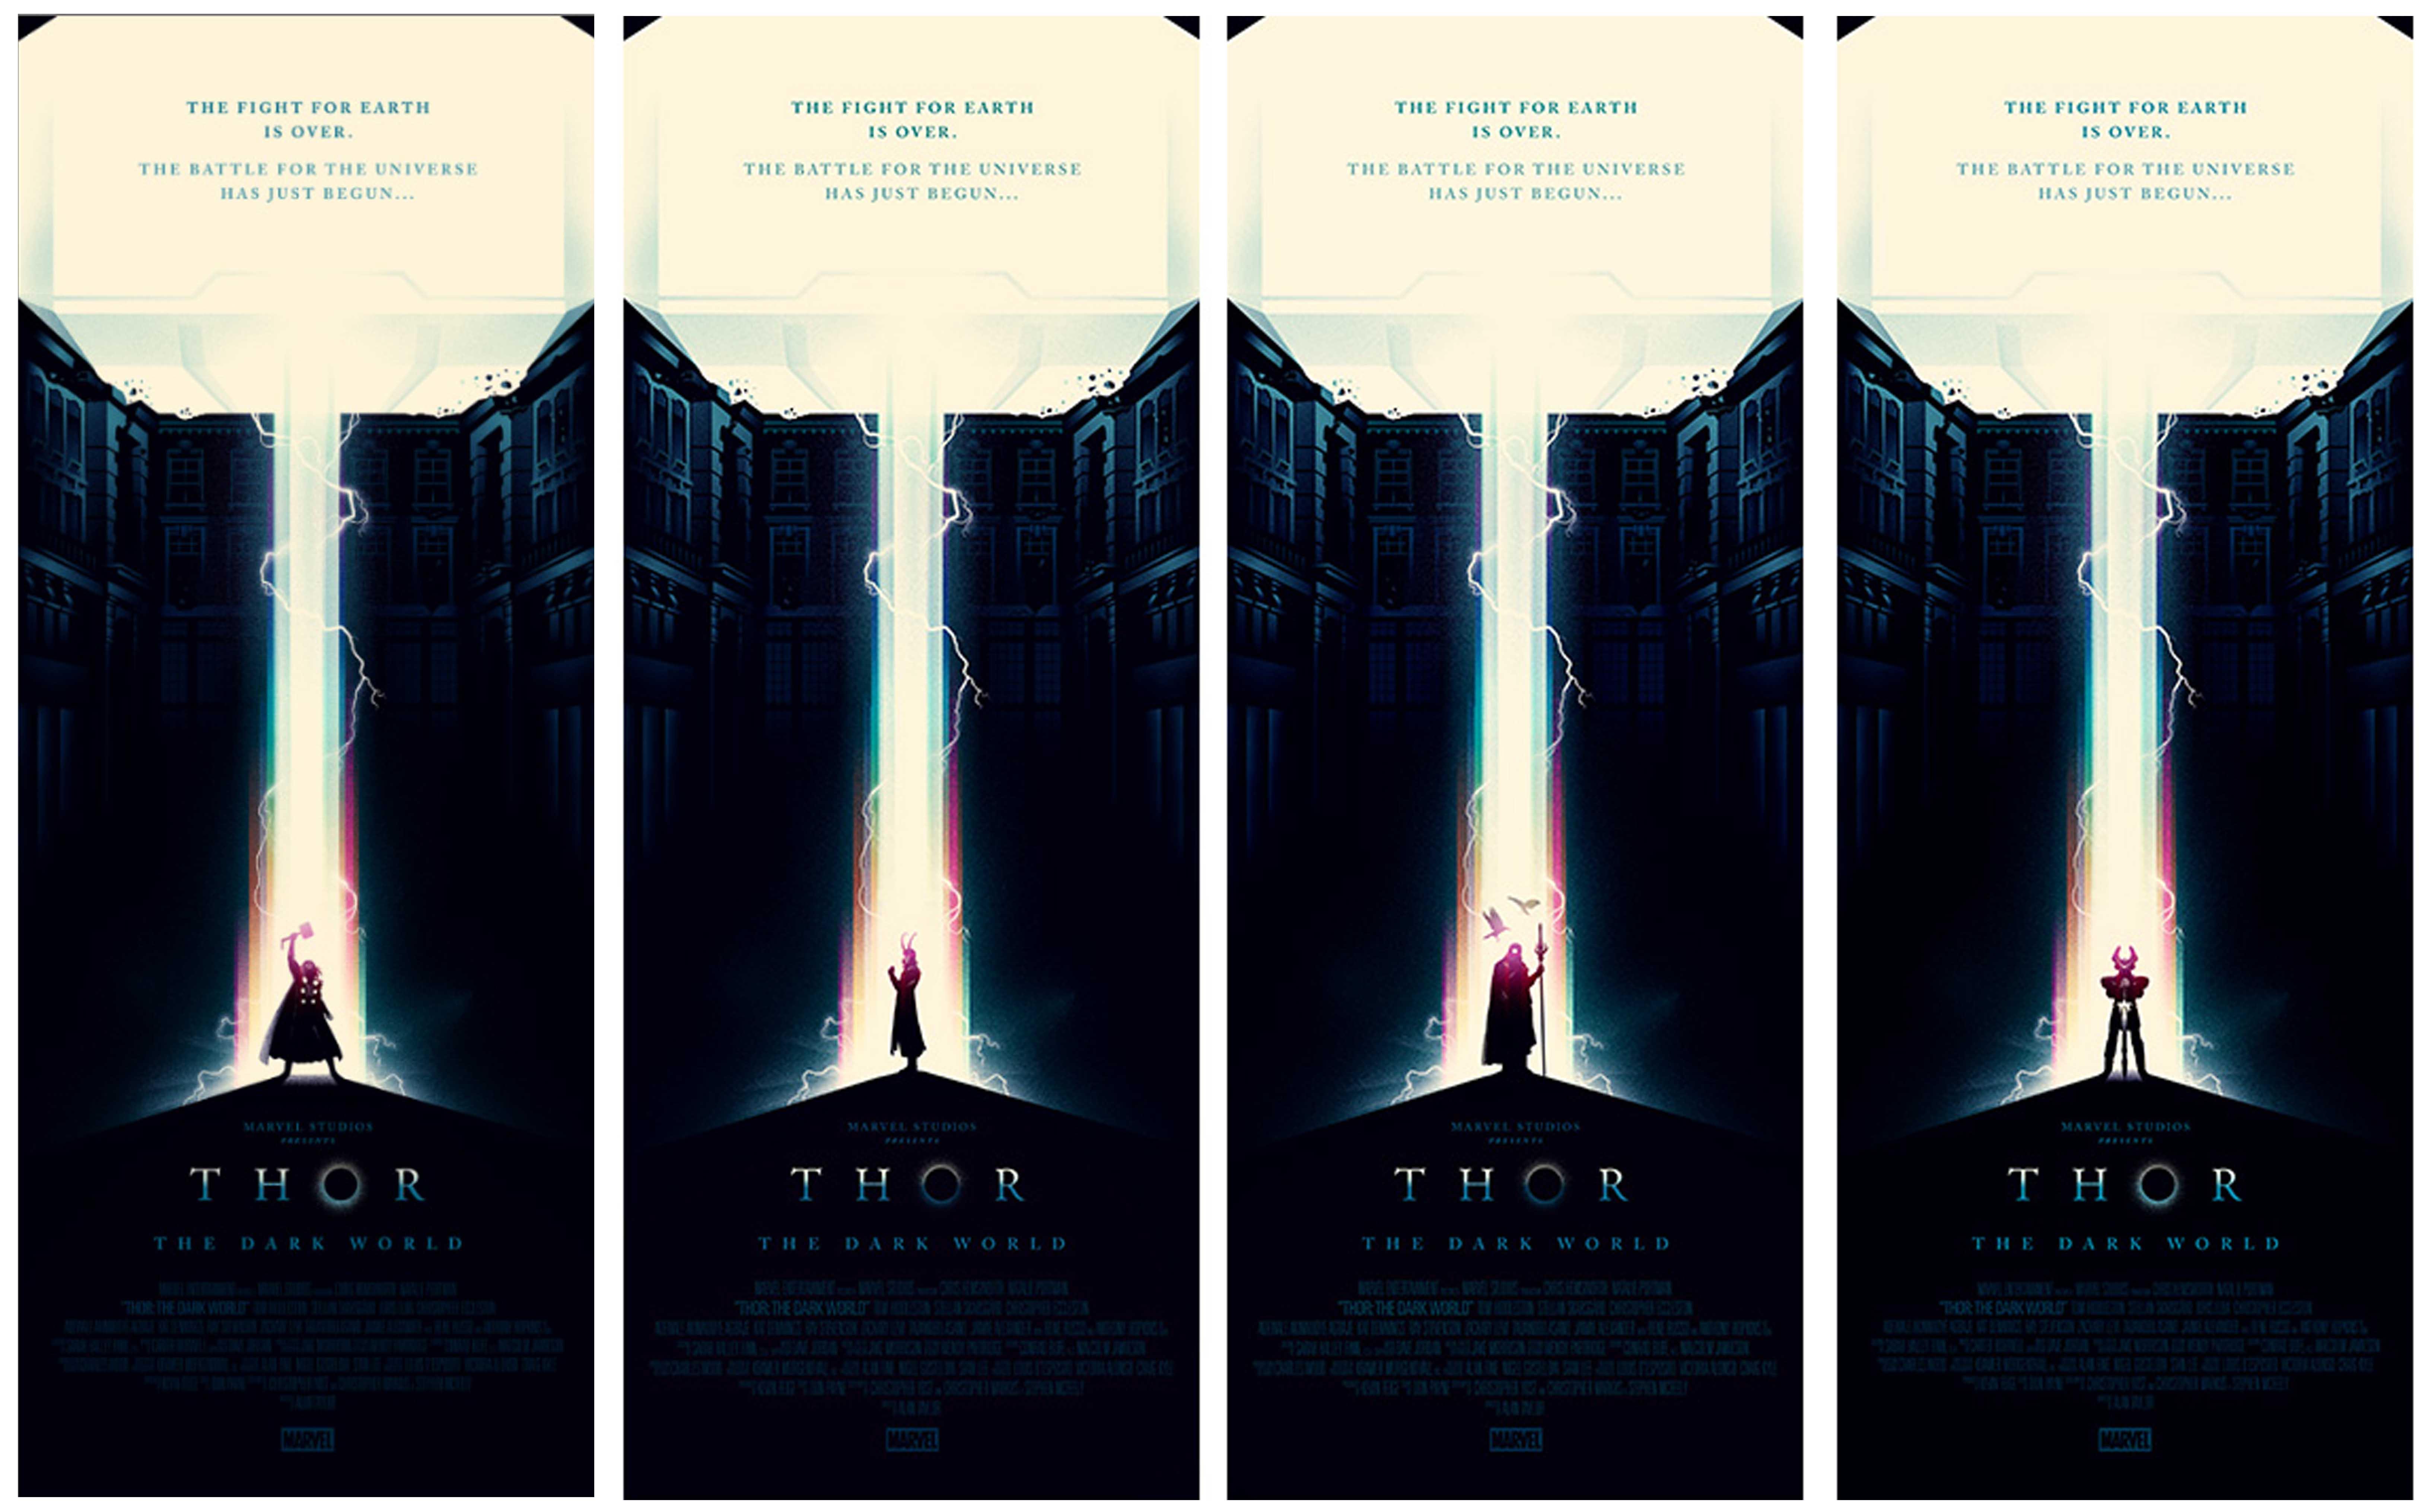 Thor-The Dark World_Olly Moss   socialpsychol